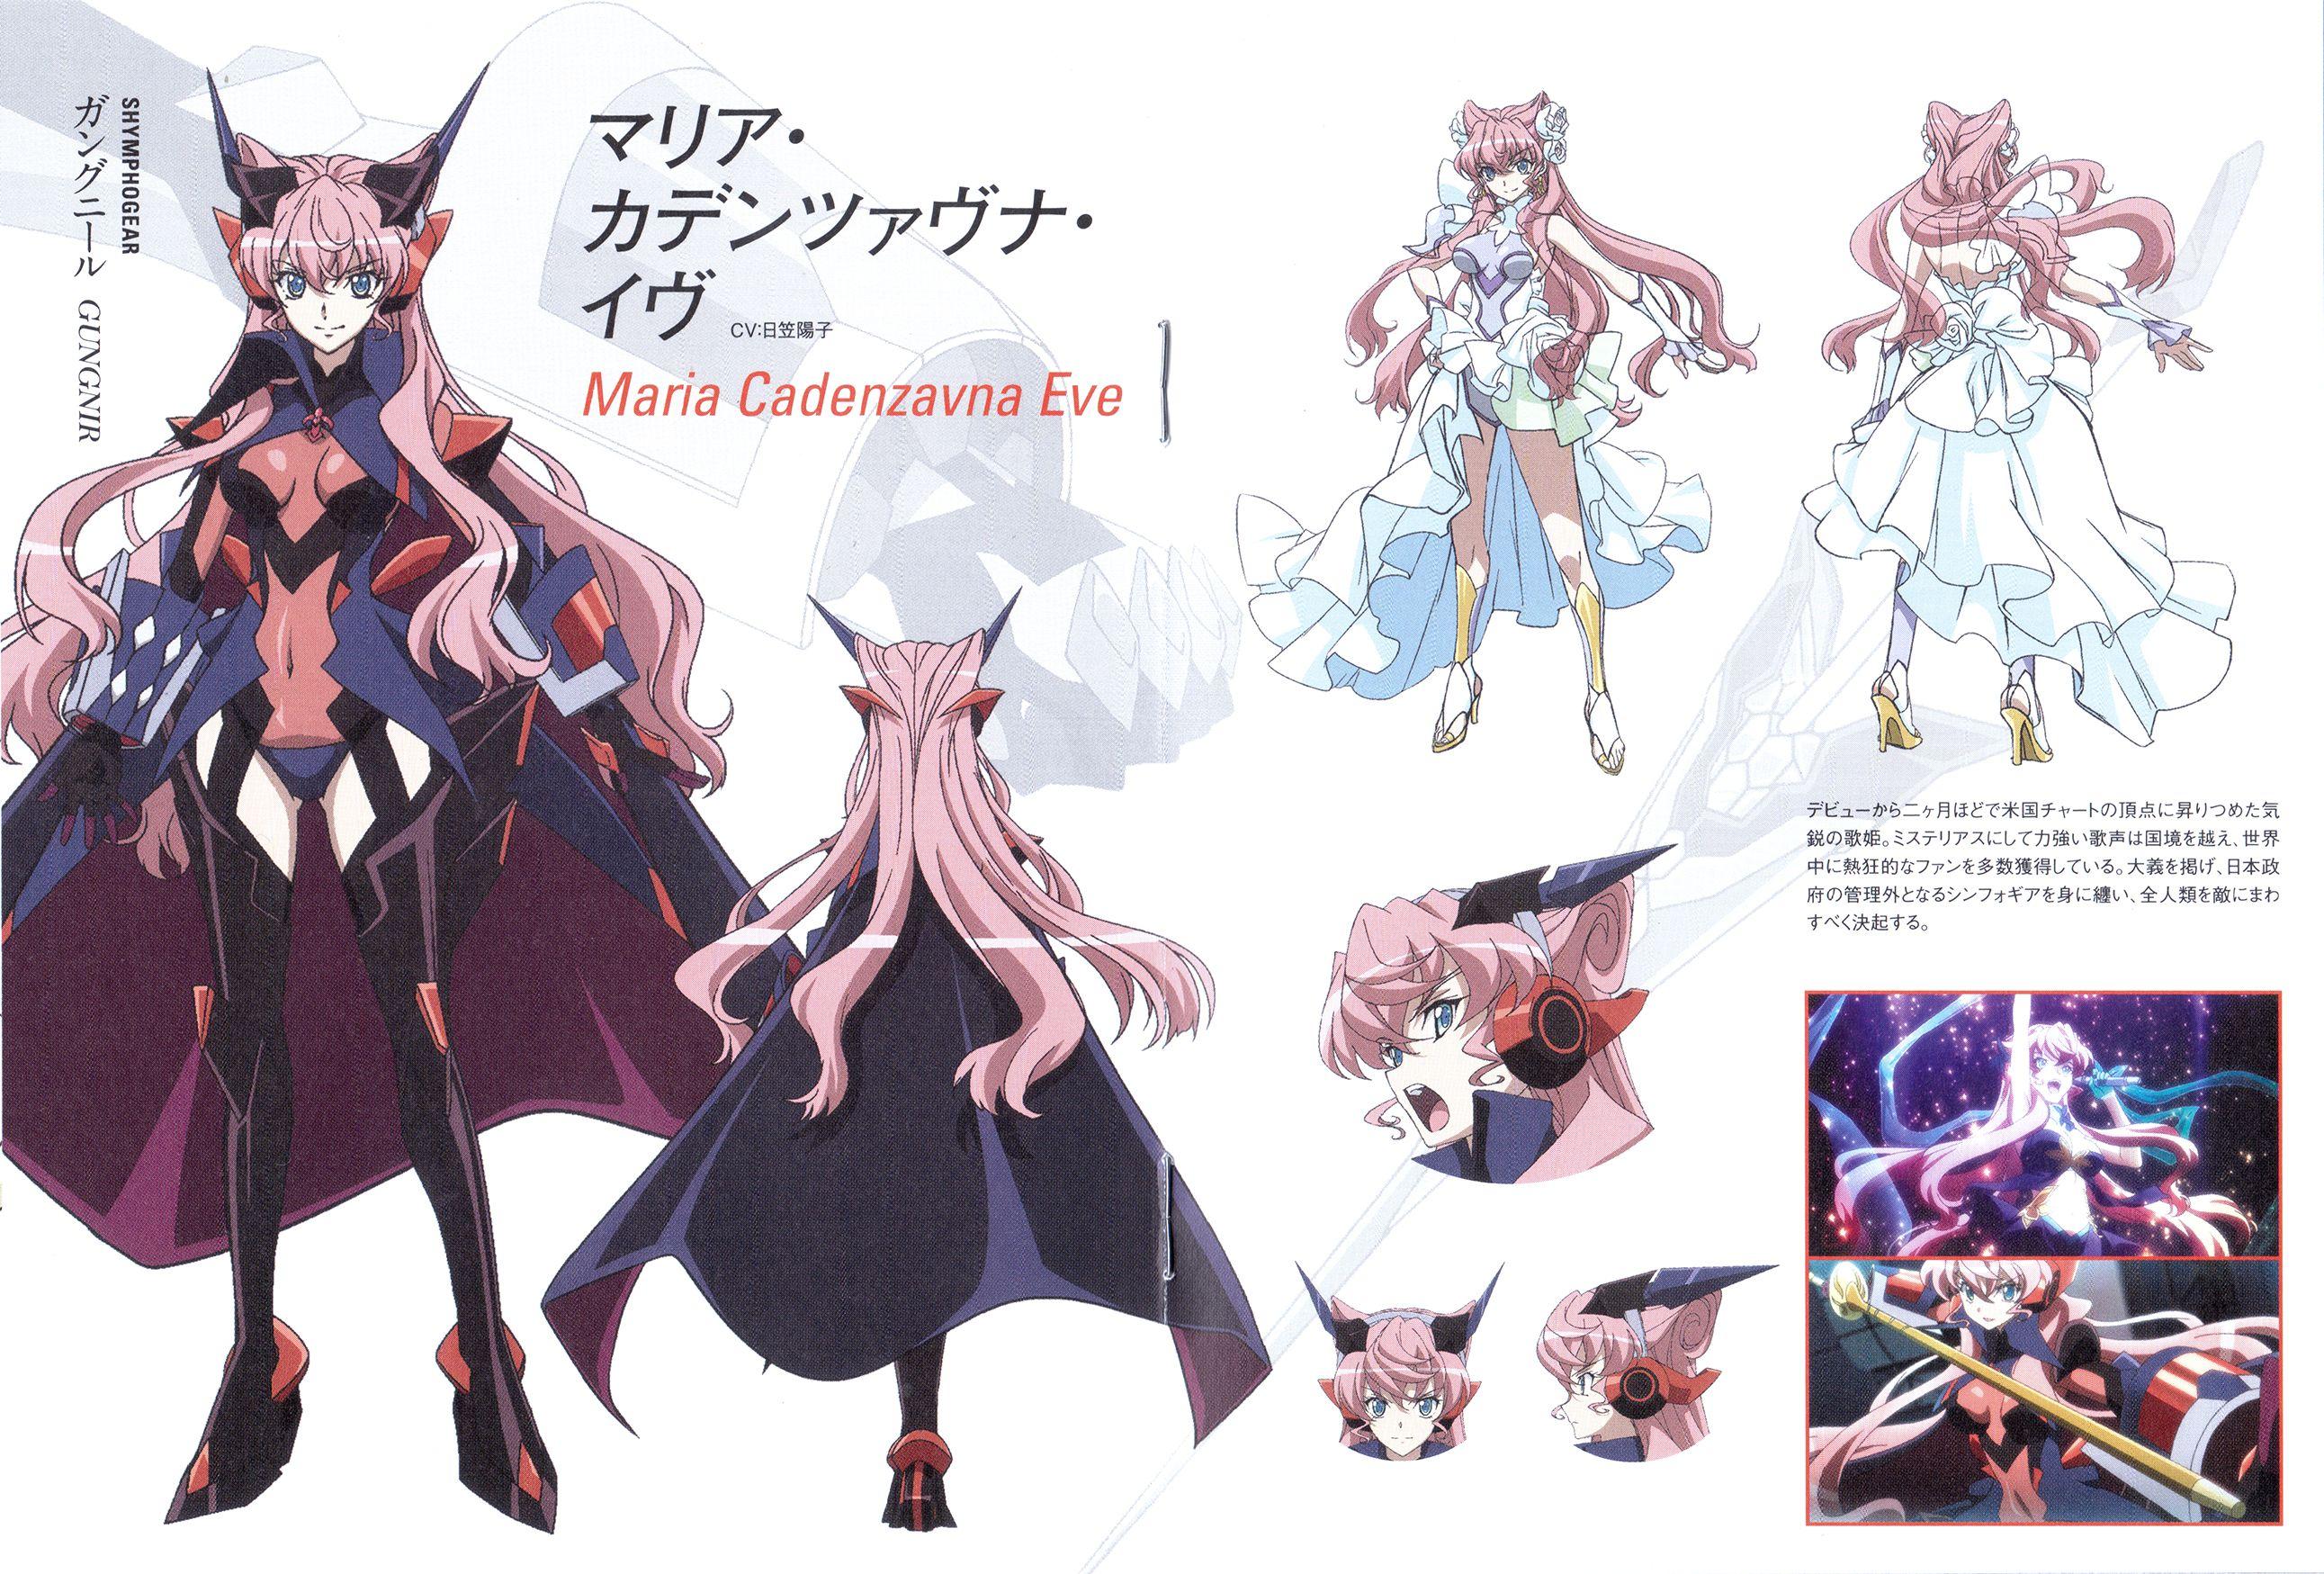 Senhime Zesshou Symphogear (2583x1749) シンフォギア, アニメキャラ, 戦